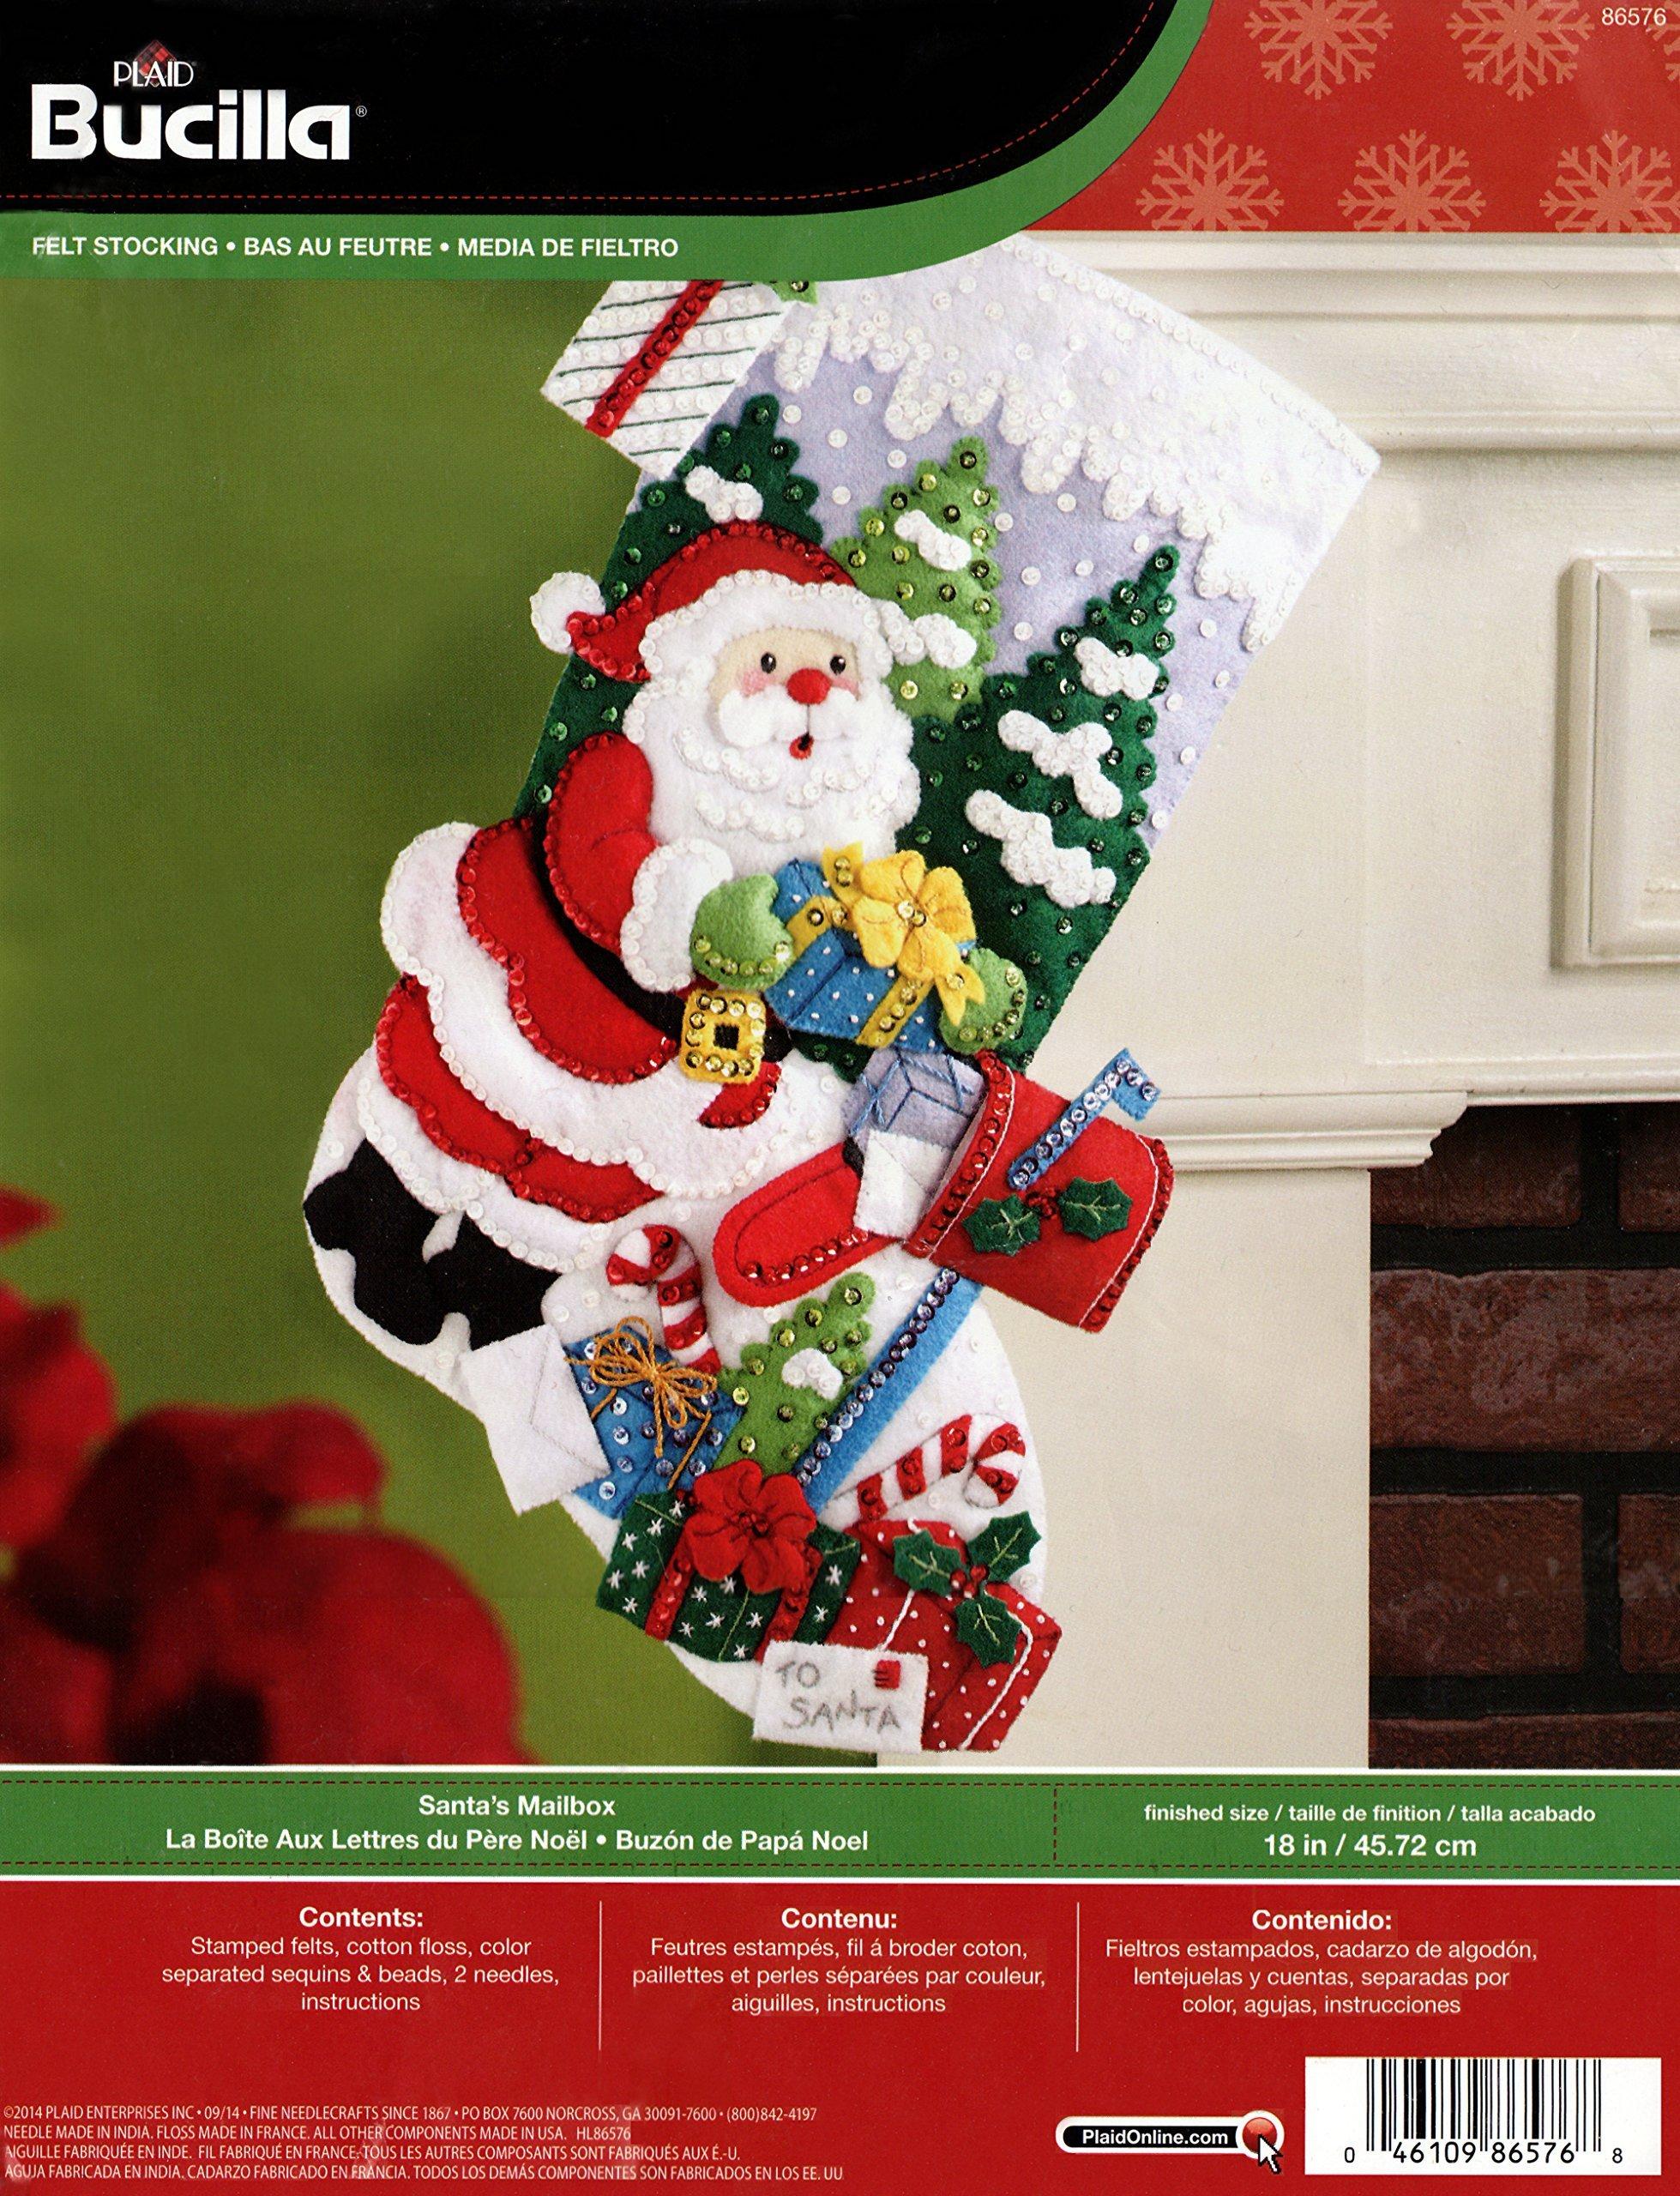 Bucilla 18-Inch Christmas Stocking Felt Applique Kit, 86576 Santas Mailbox product image